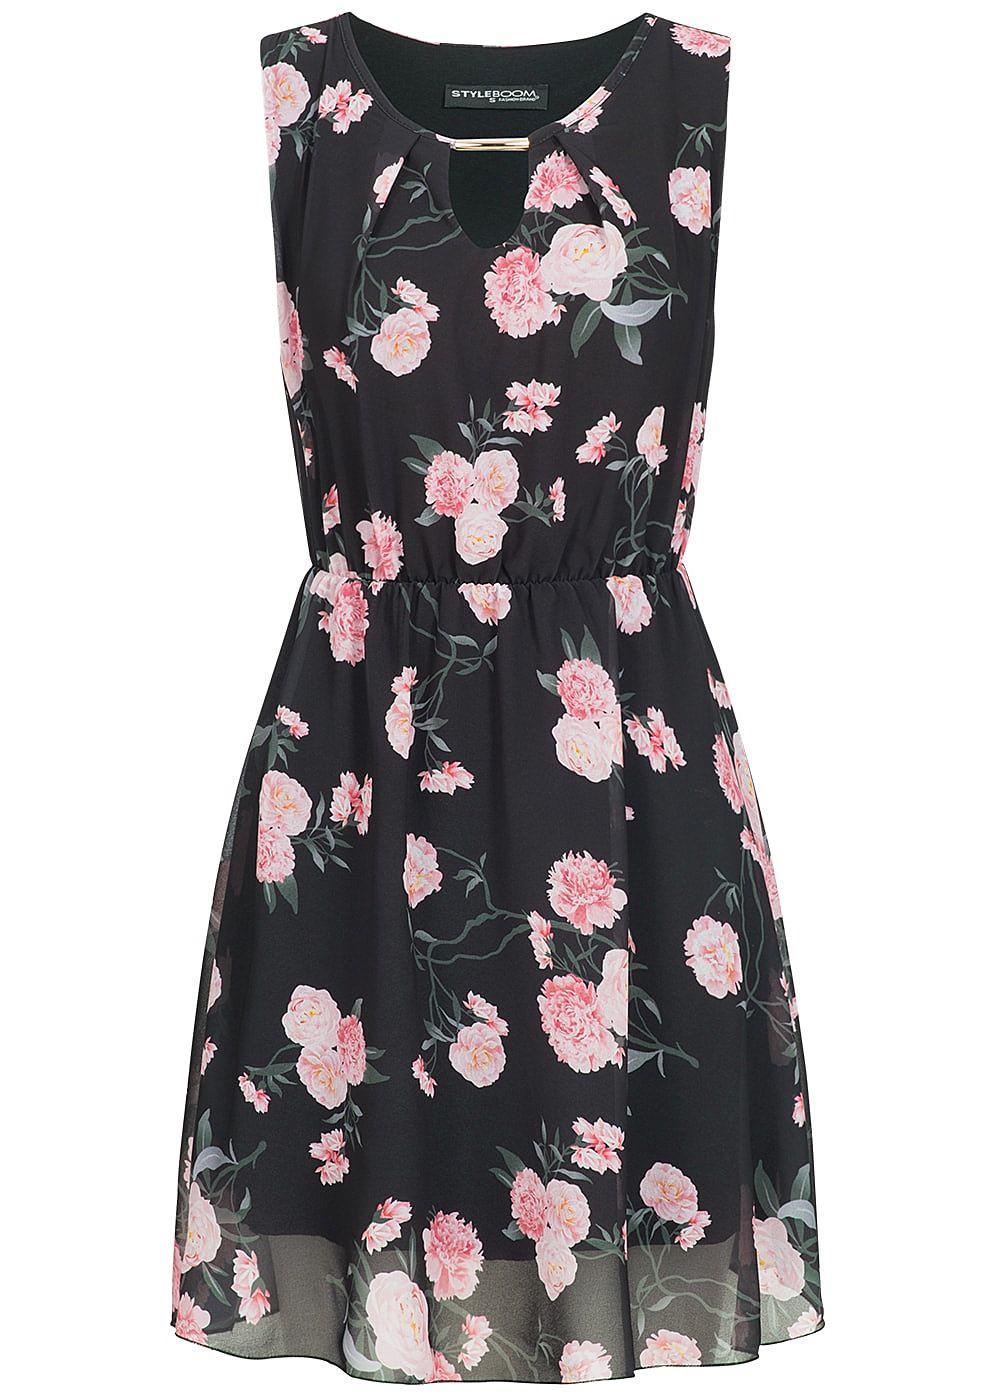 styleboom fashion damen kleid blumen muster r hren ornament 2 lagig schwarz rosa 77onlineshop. Black Bedroom Furniture Sets. Home Design Ideas